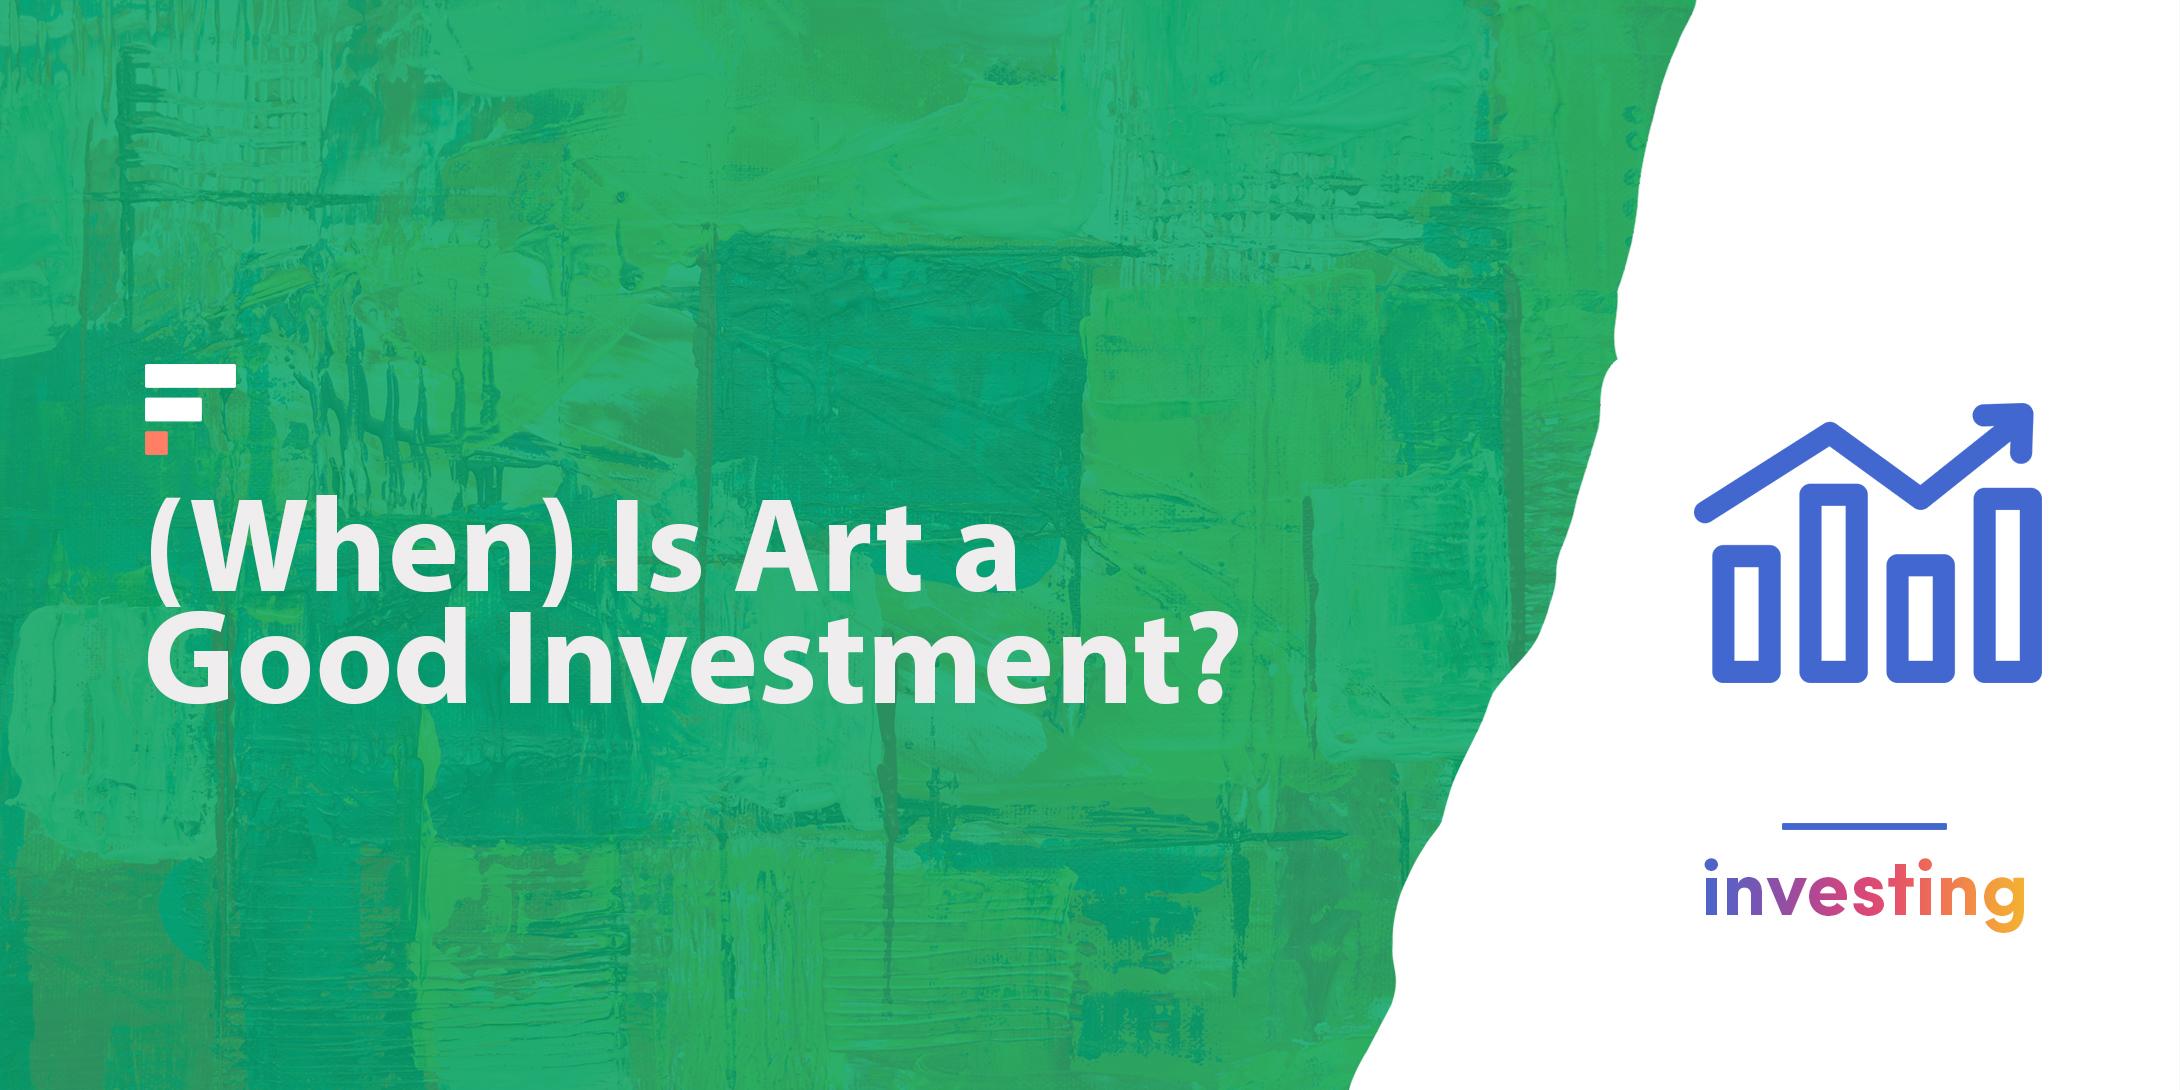 Investing in art